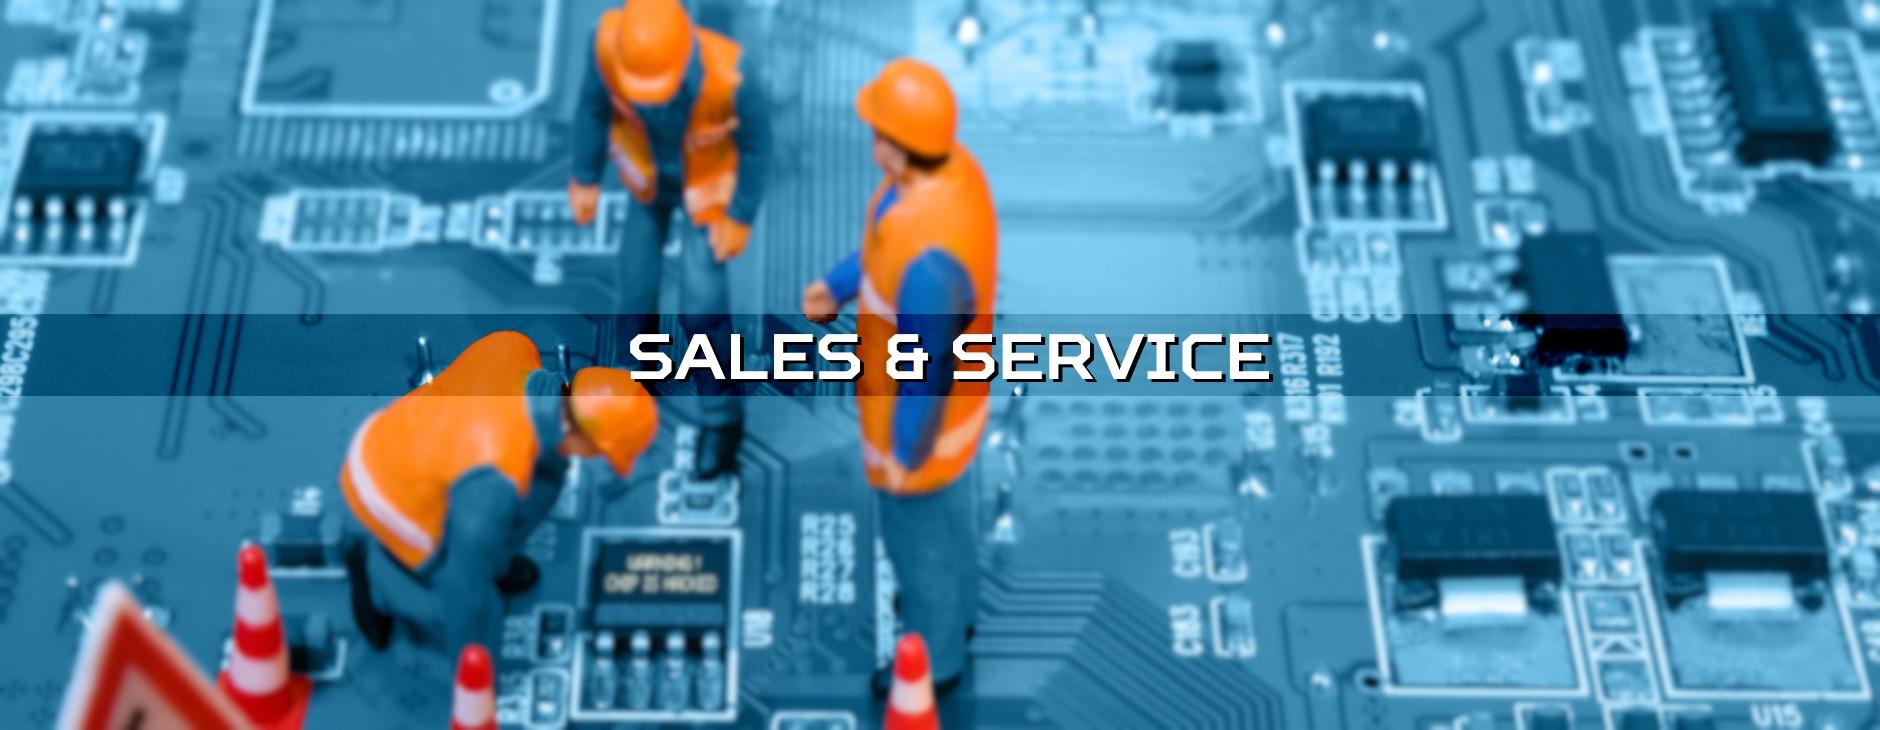 Sales-Service-2.jpg